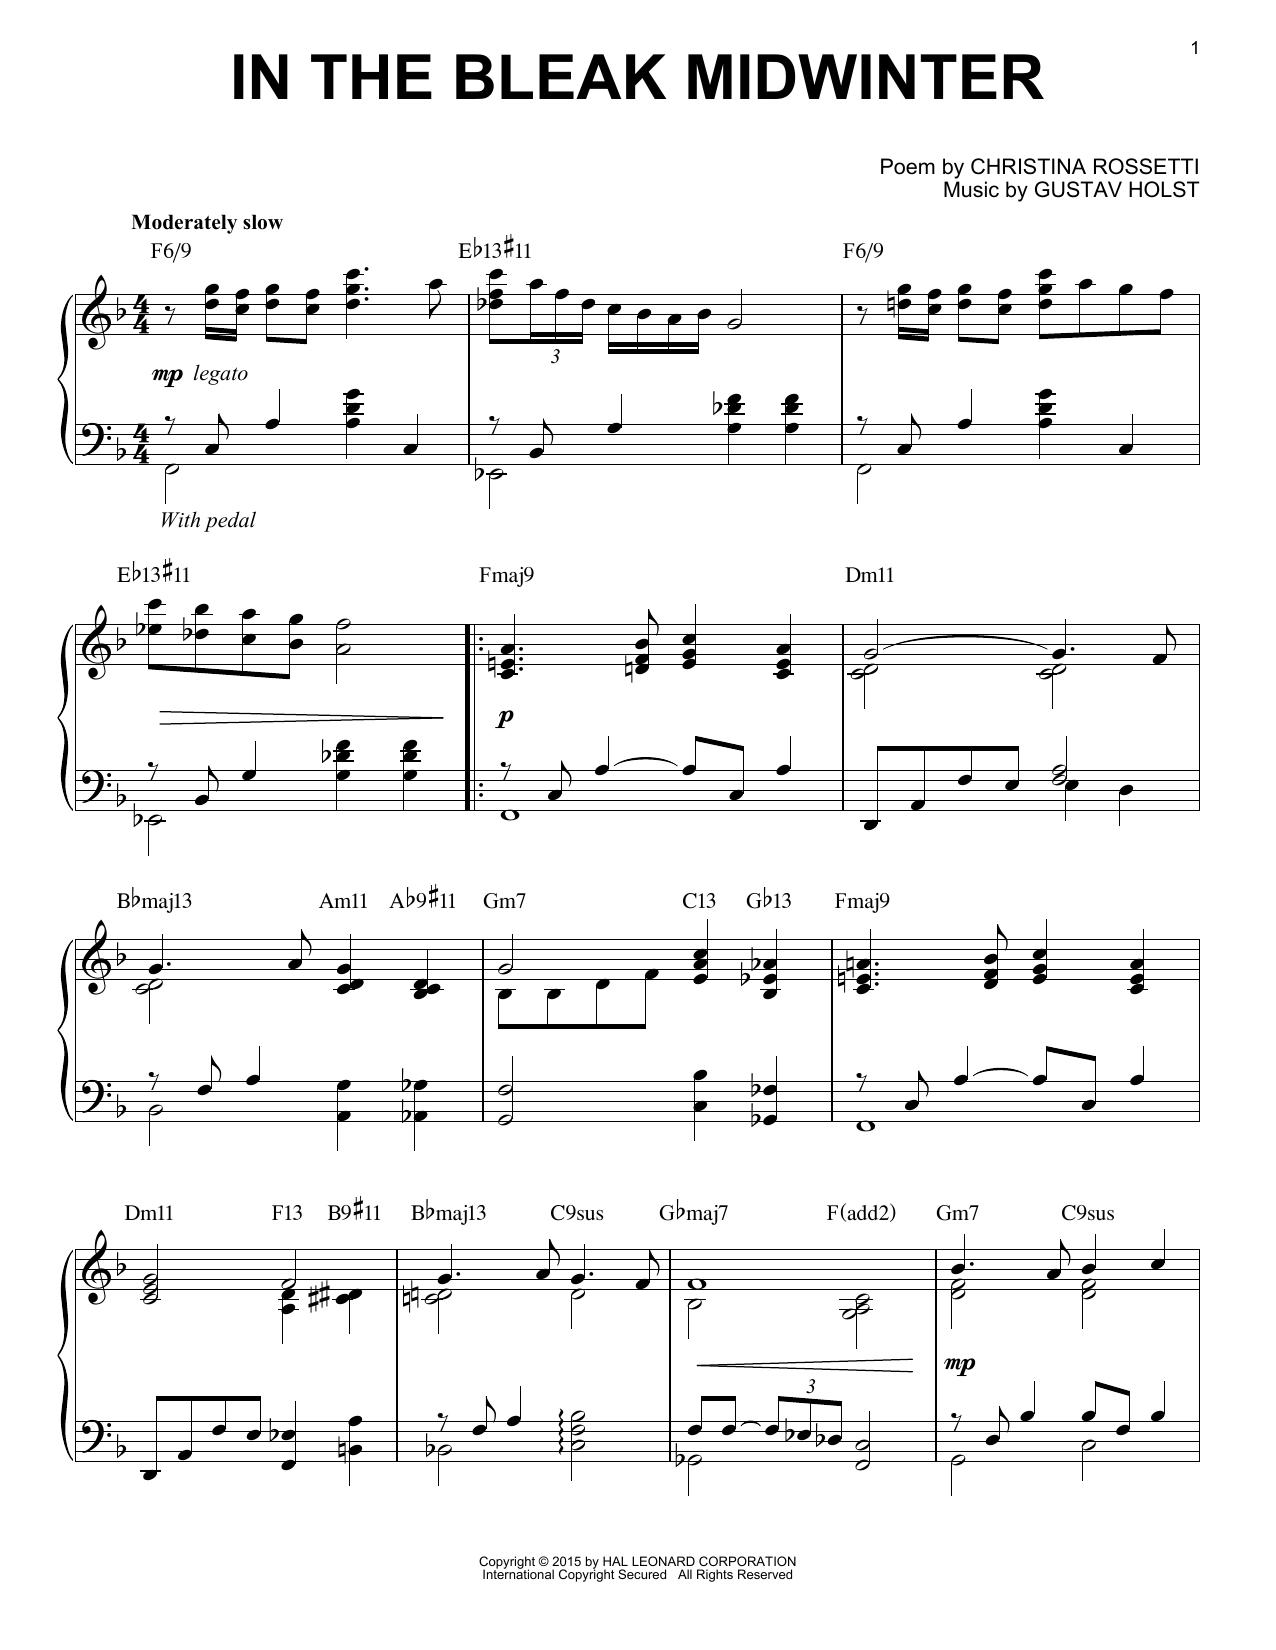 Sheet Music Digital Files To Print Licensed Christina Rossetti